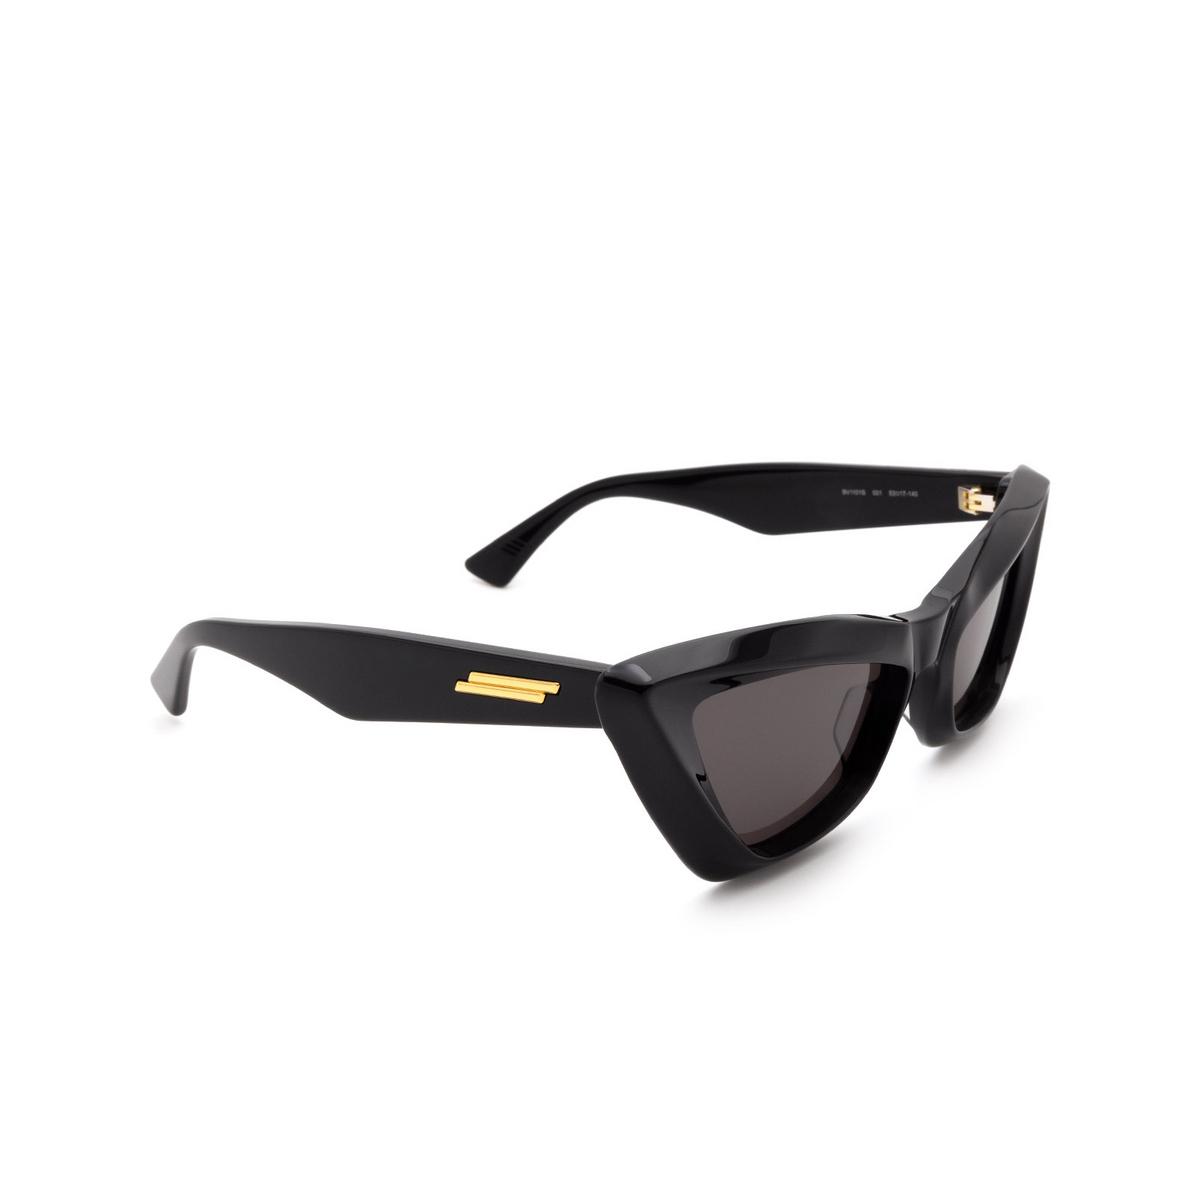 Bottega Veneta® Cat-eye Sunglasses: BV1101S color Black 001 - three-quarters view.